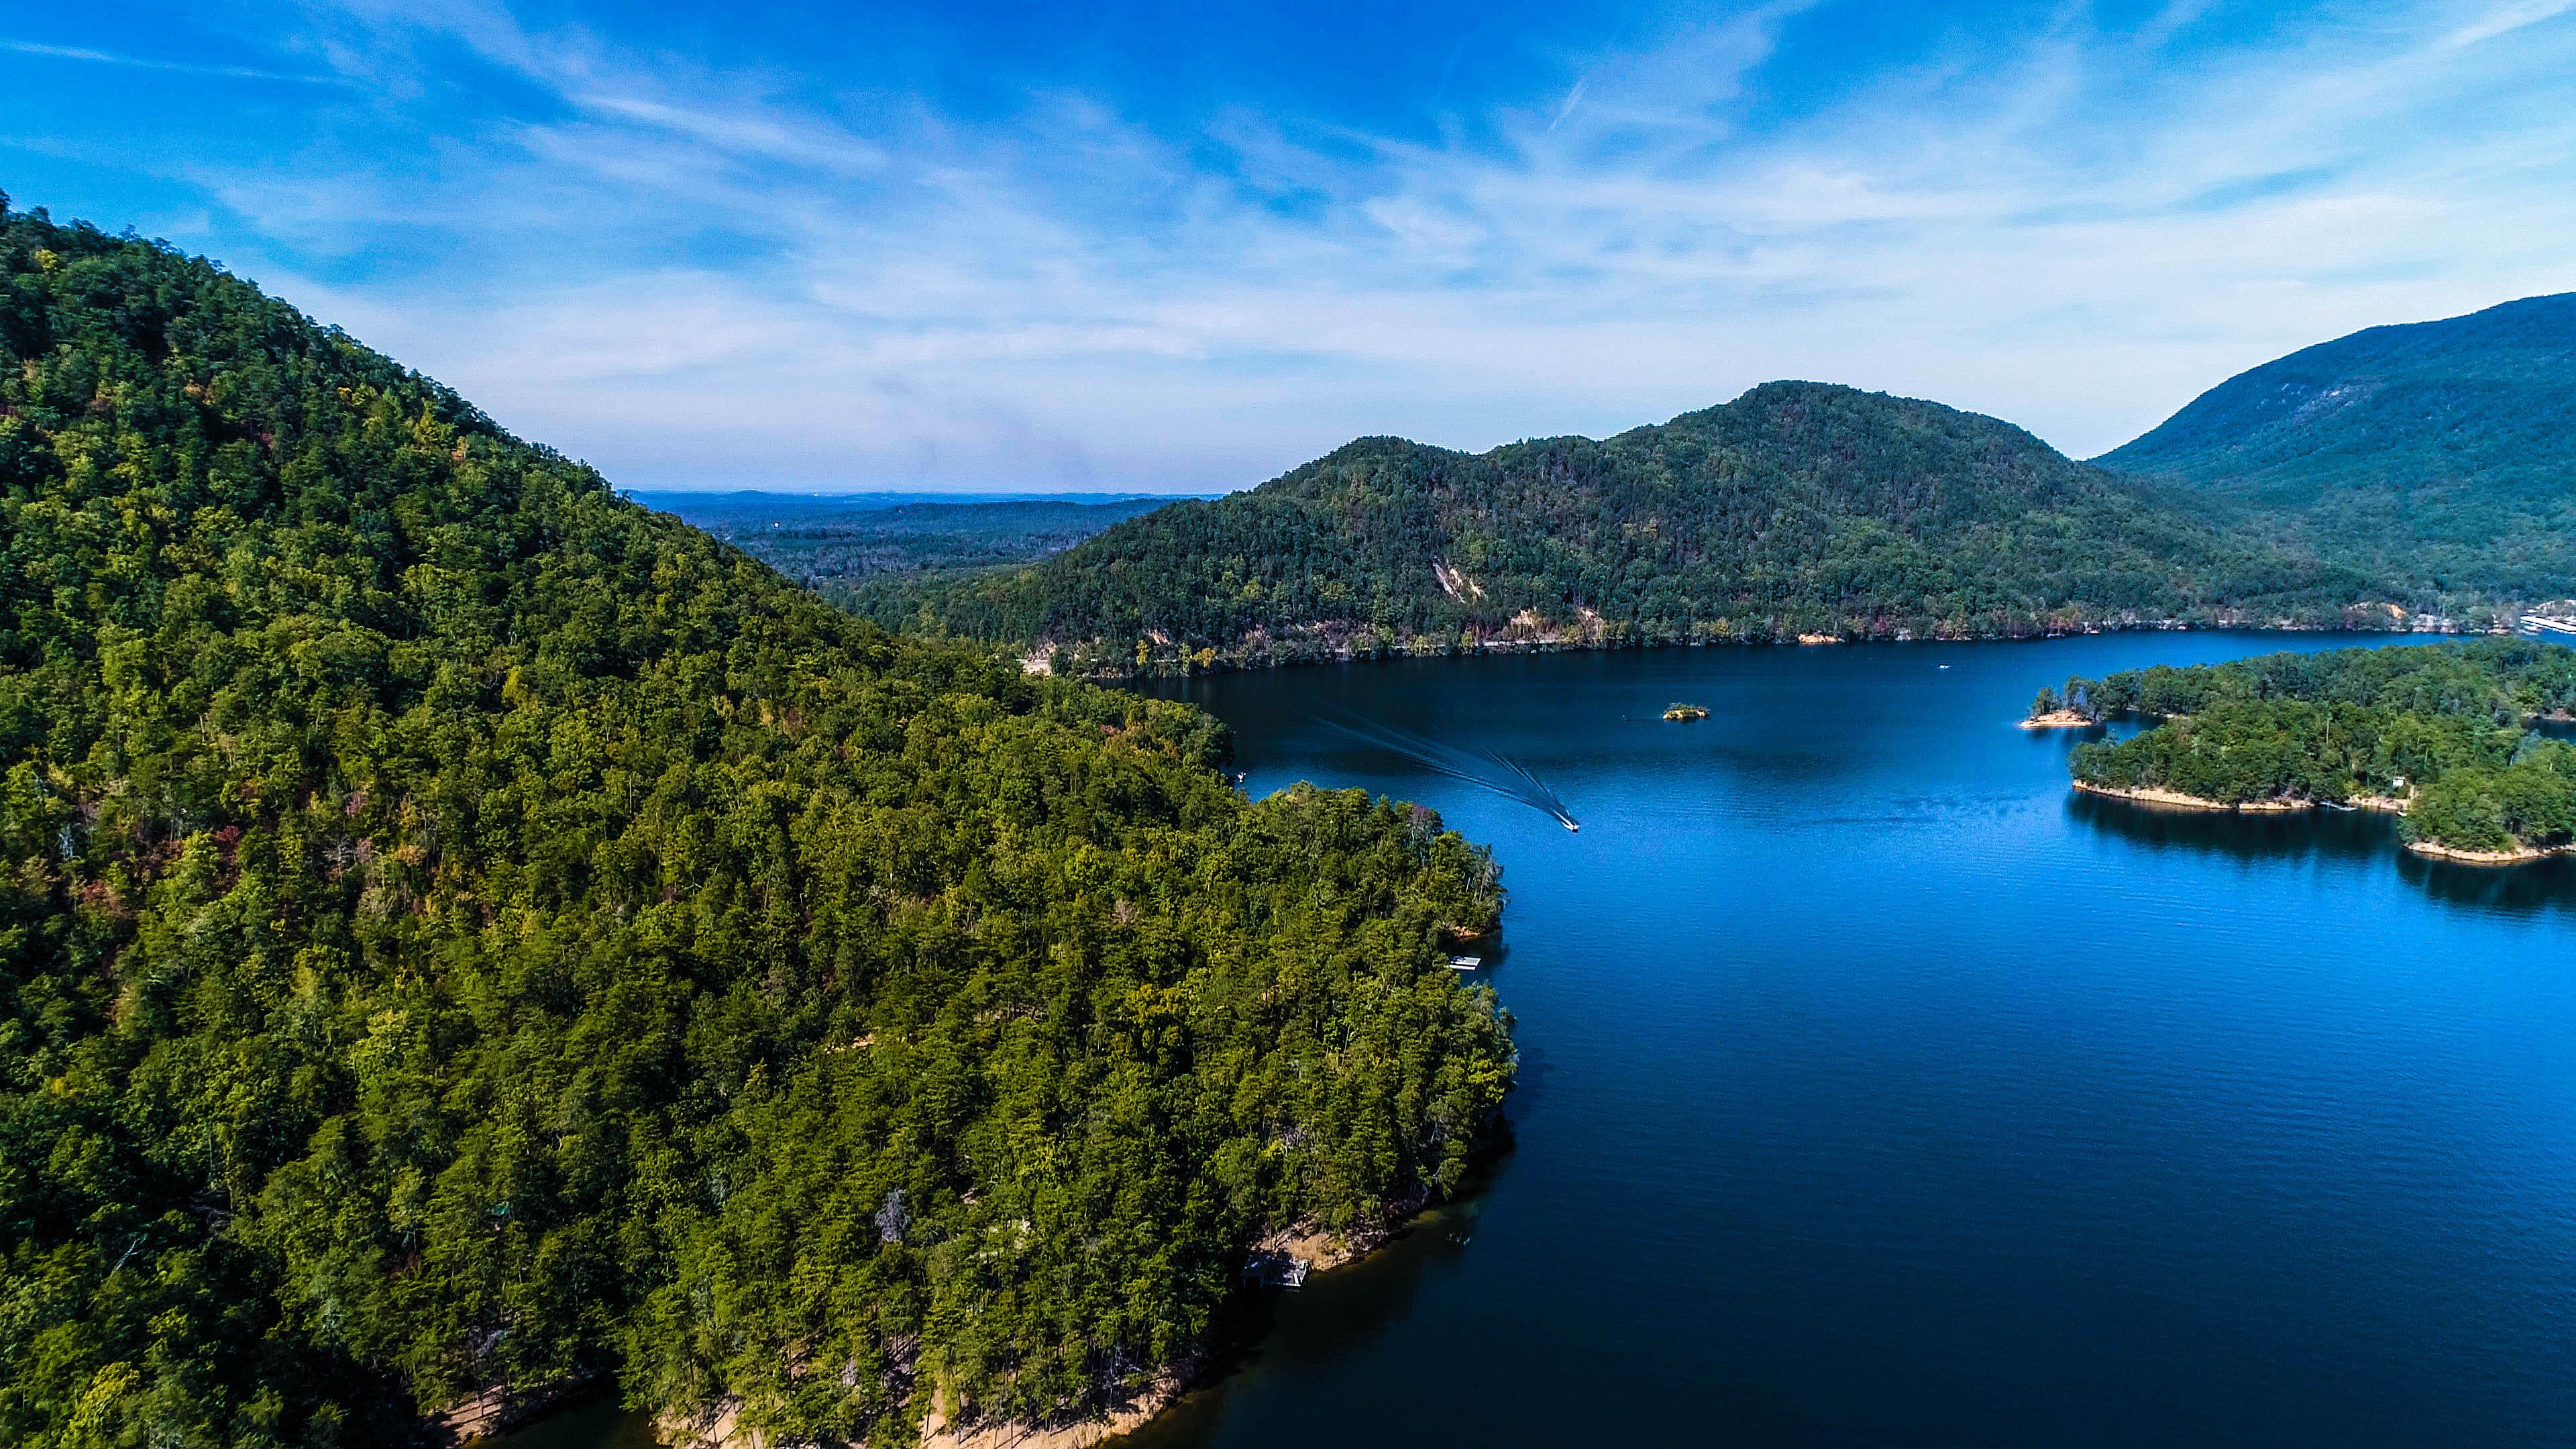 Parksville Lake Landscape